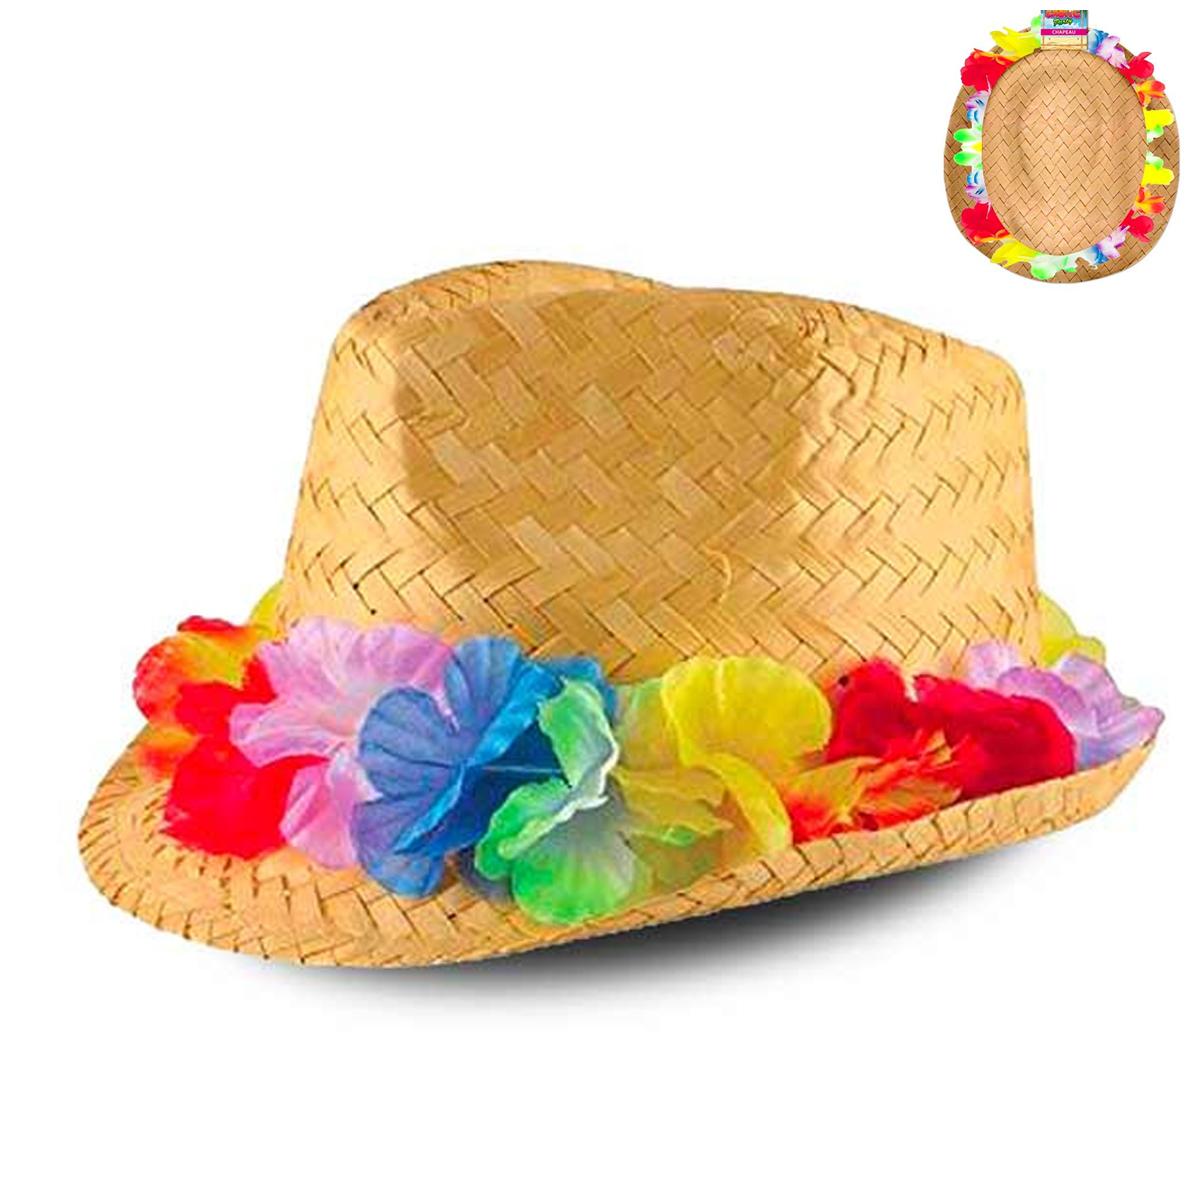 Chapeau borsalino paille \'Hawaï\' beige multicolore - taille unique - [R2737]